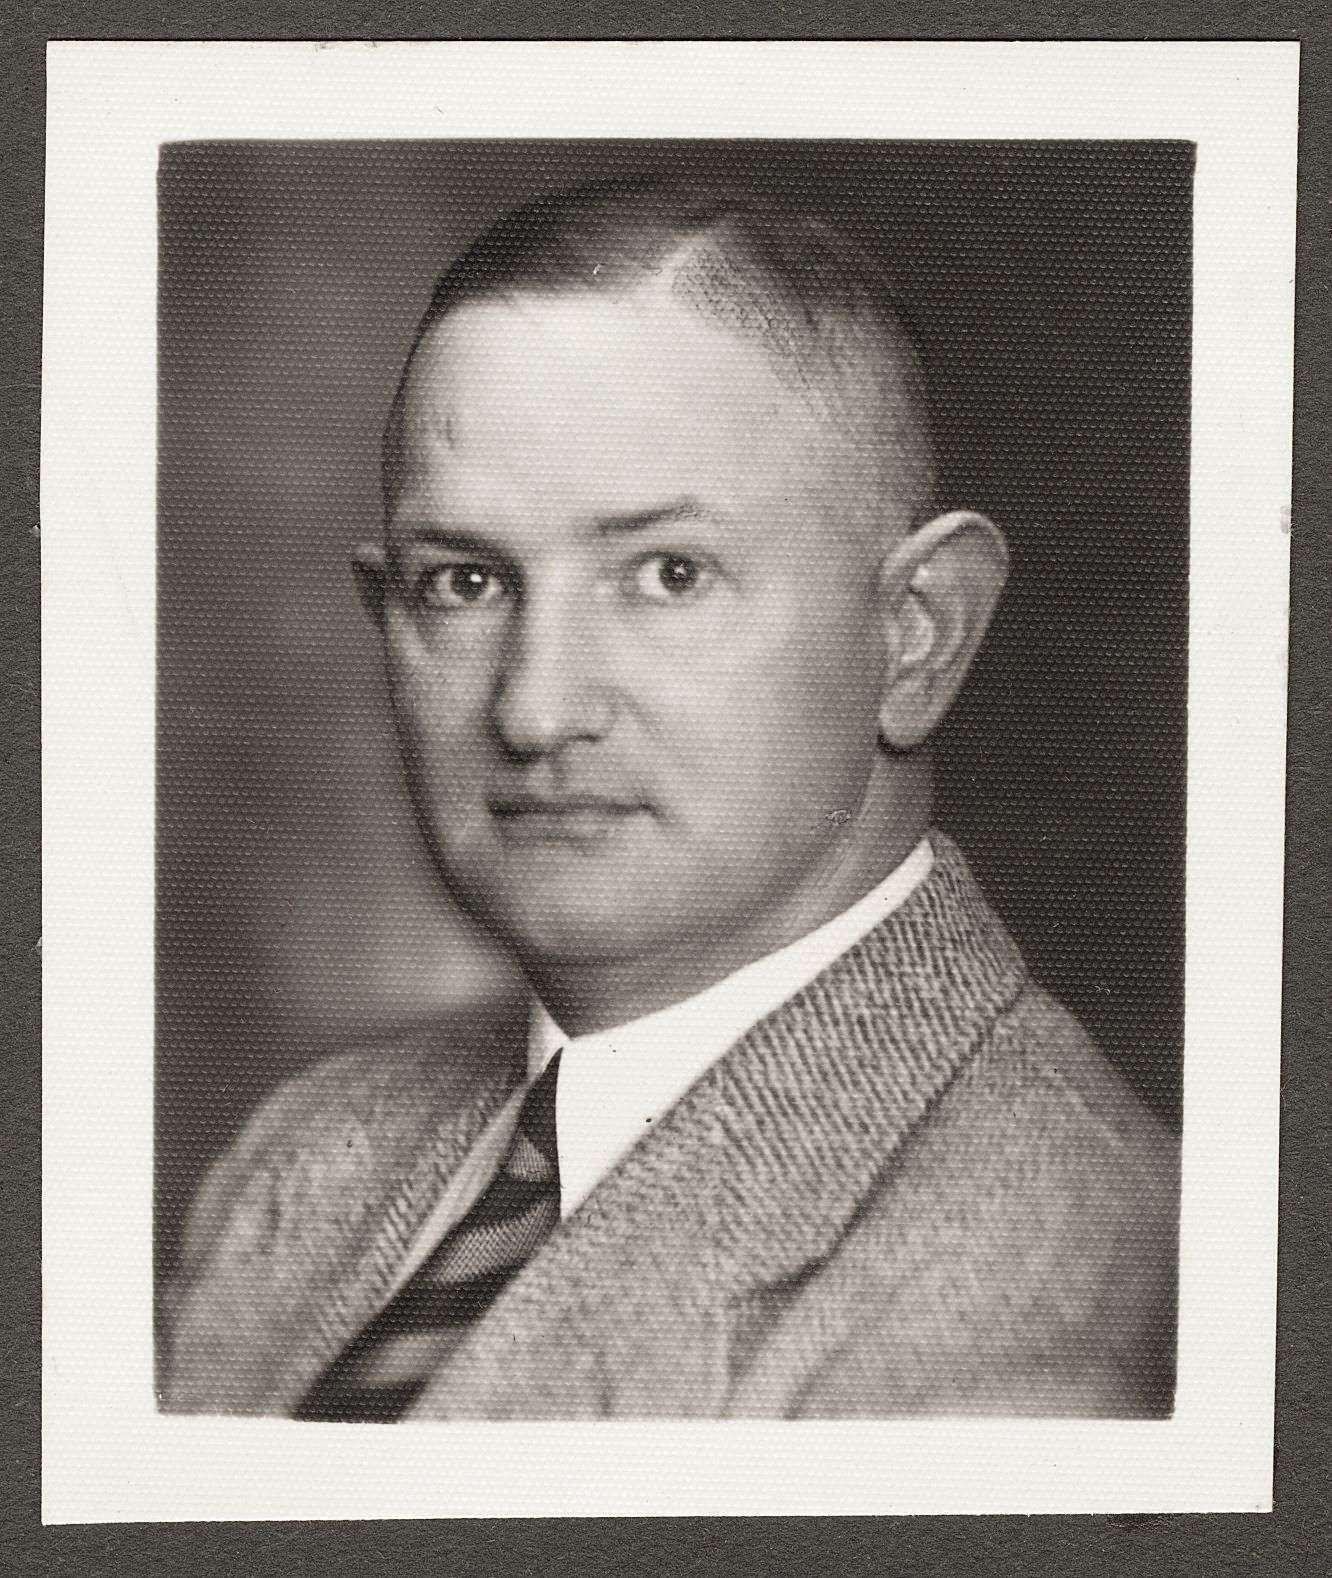 Heudorfer, Hermann, Dr., Bild 1